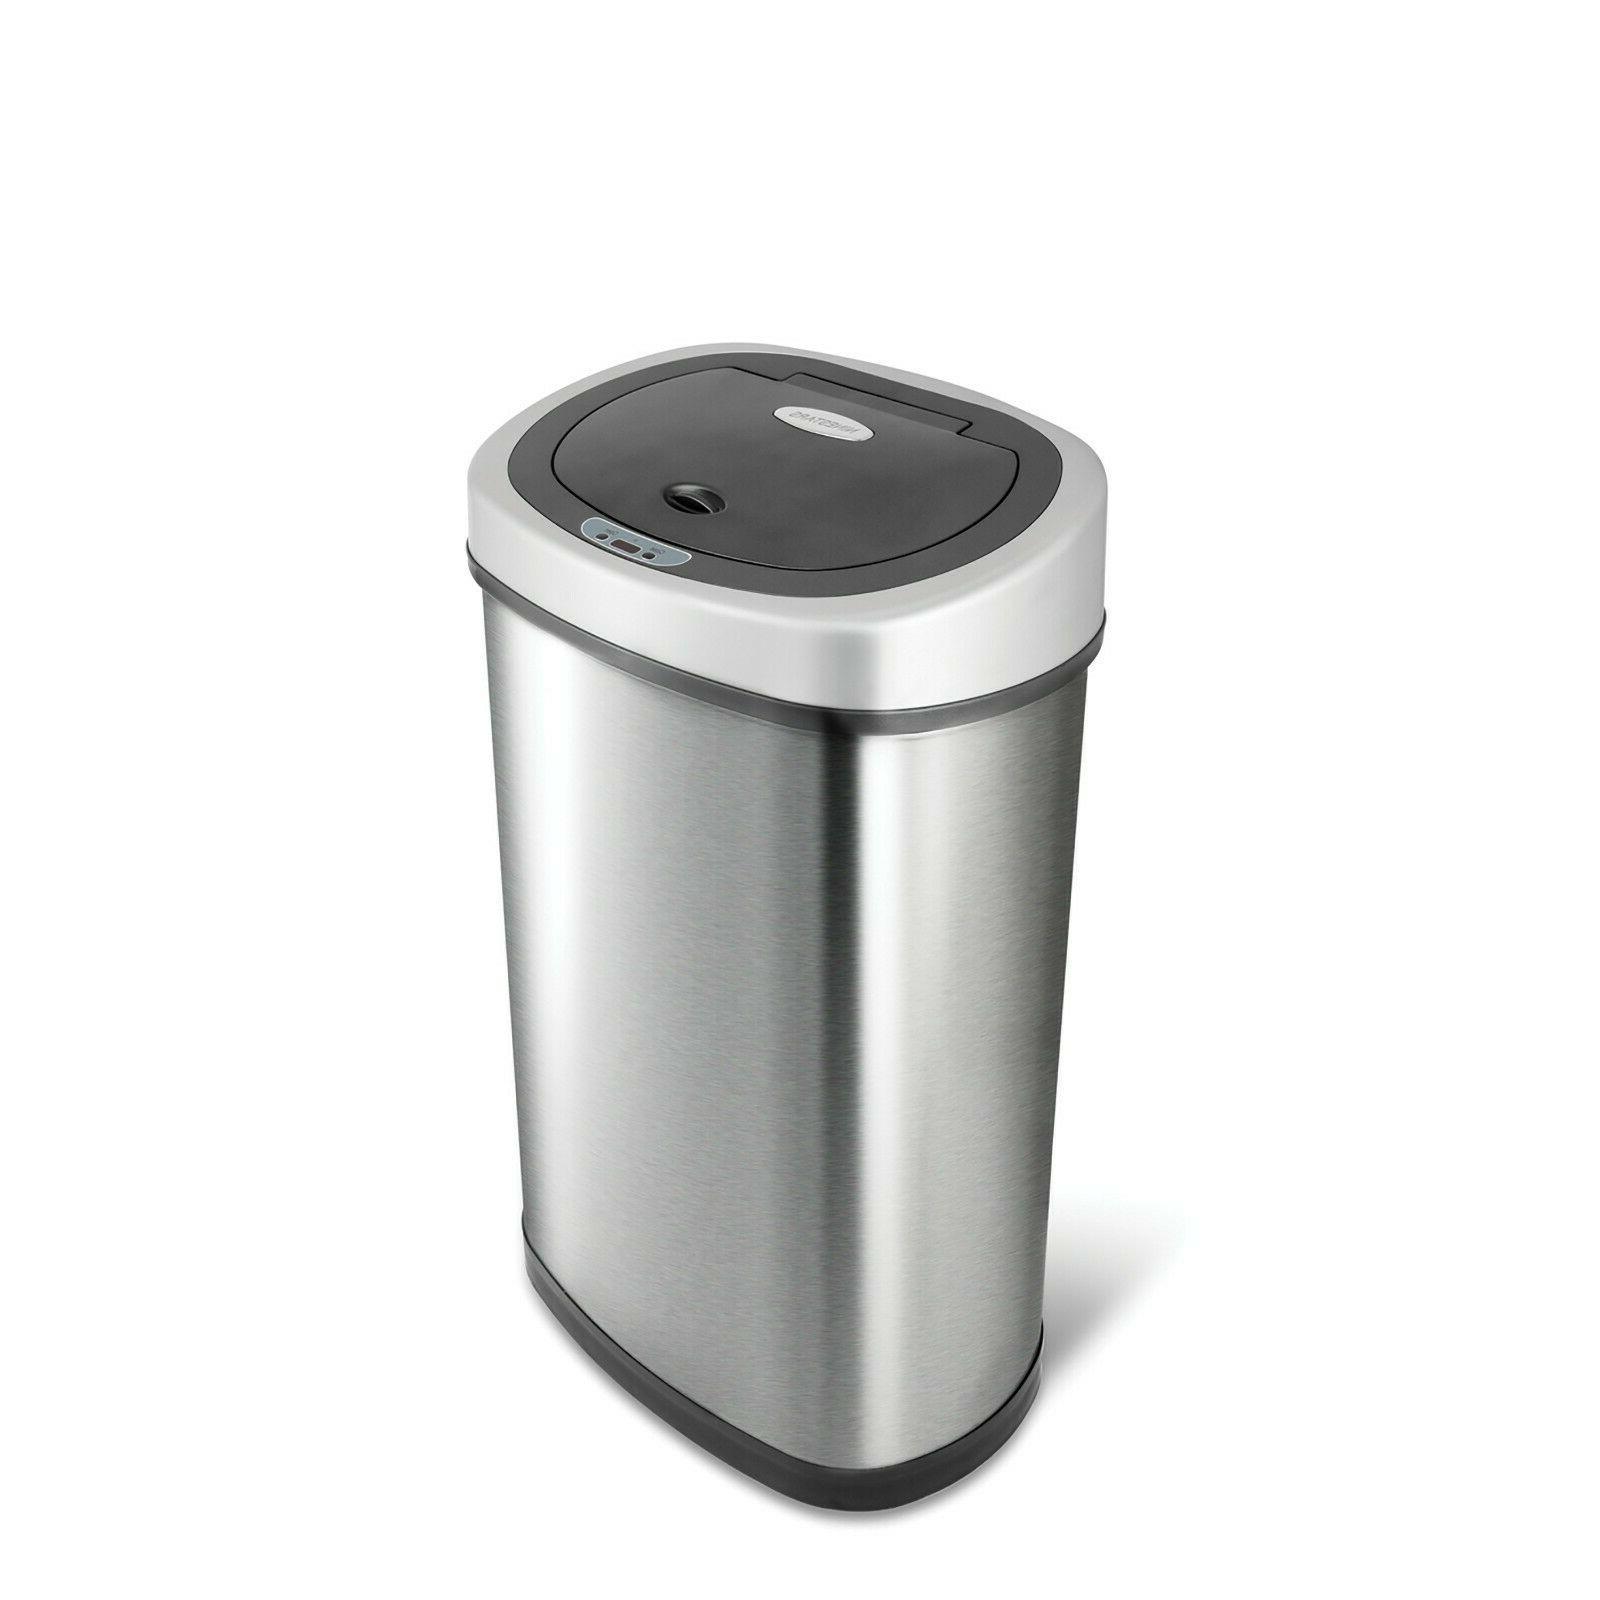 NineStars Motion Sensor 13.2-Gallon Can Multi Color